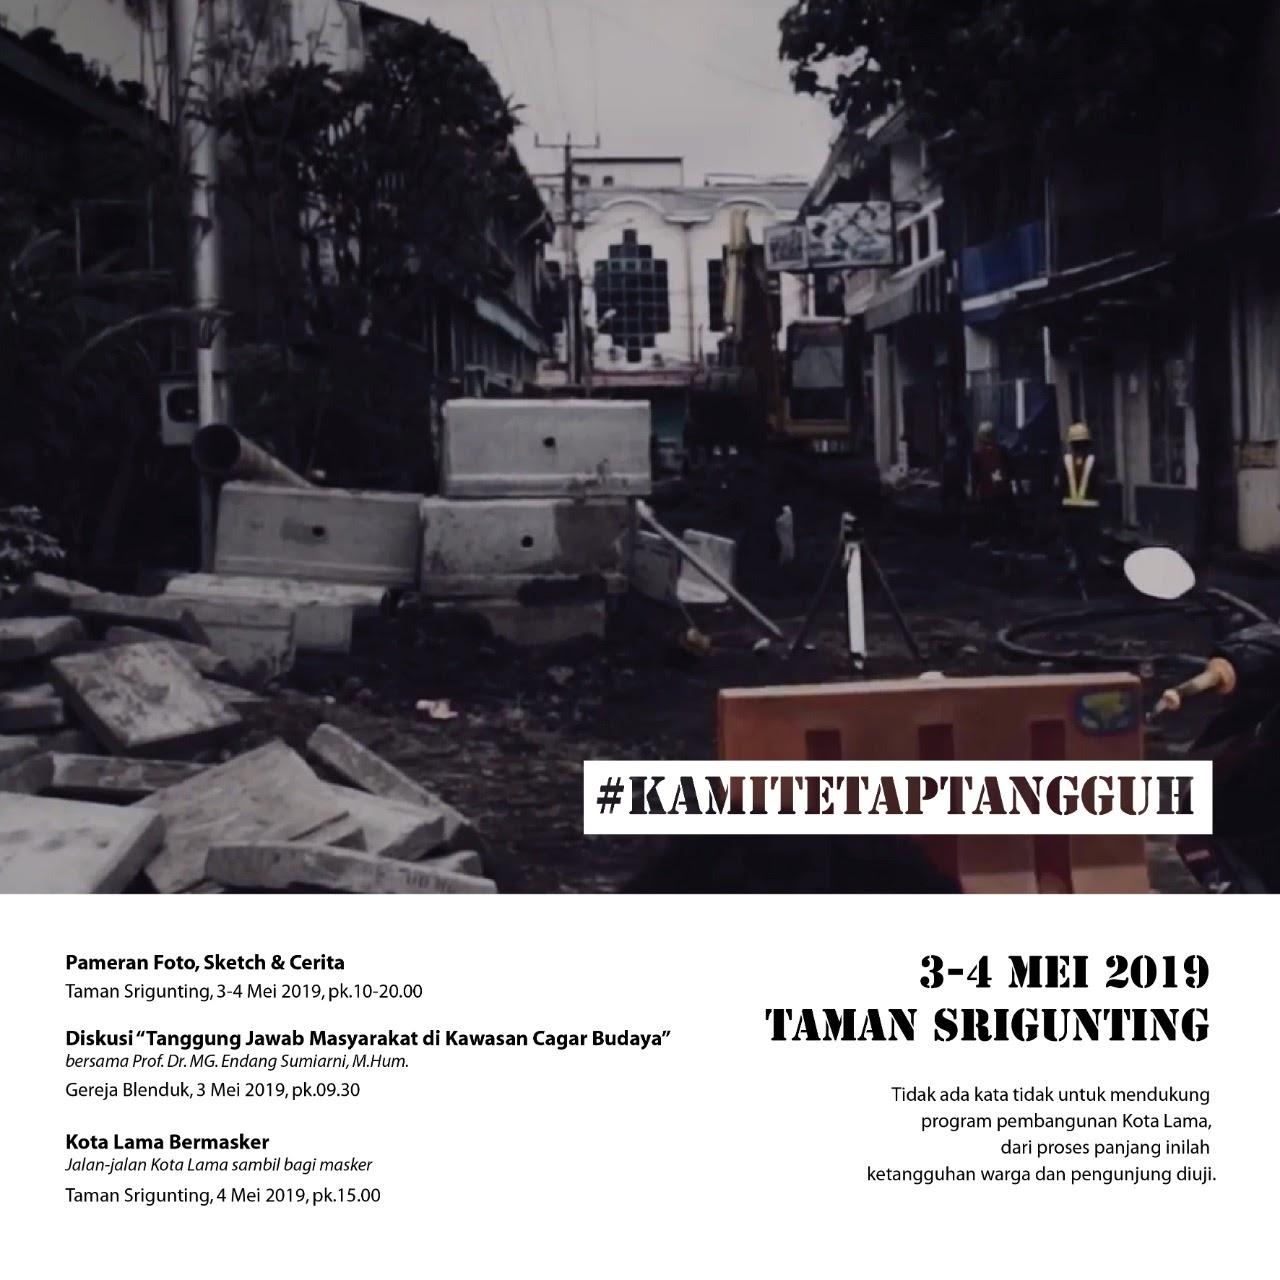 #KamiTetapTangguh, Acara Forum Warga Kota Lama Meriahkan HUT Kota Semarang Ke-472